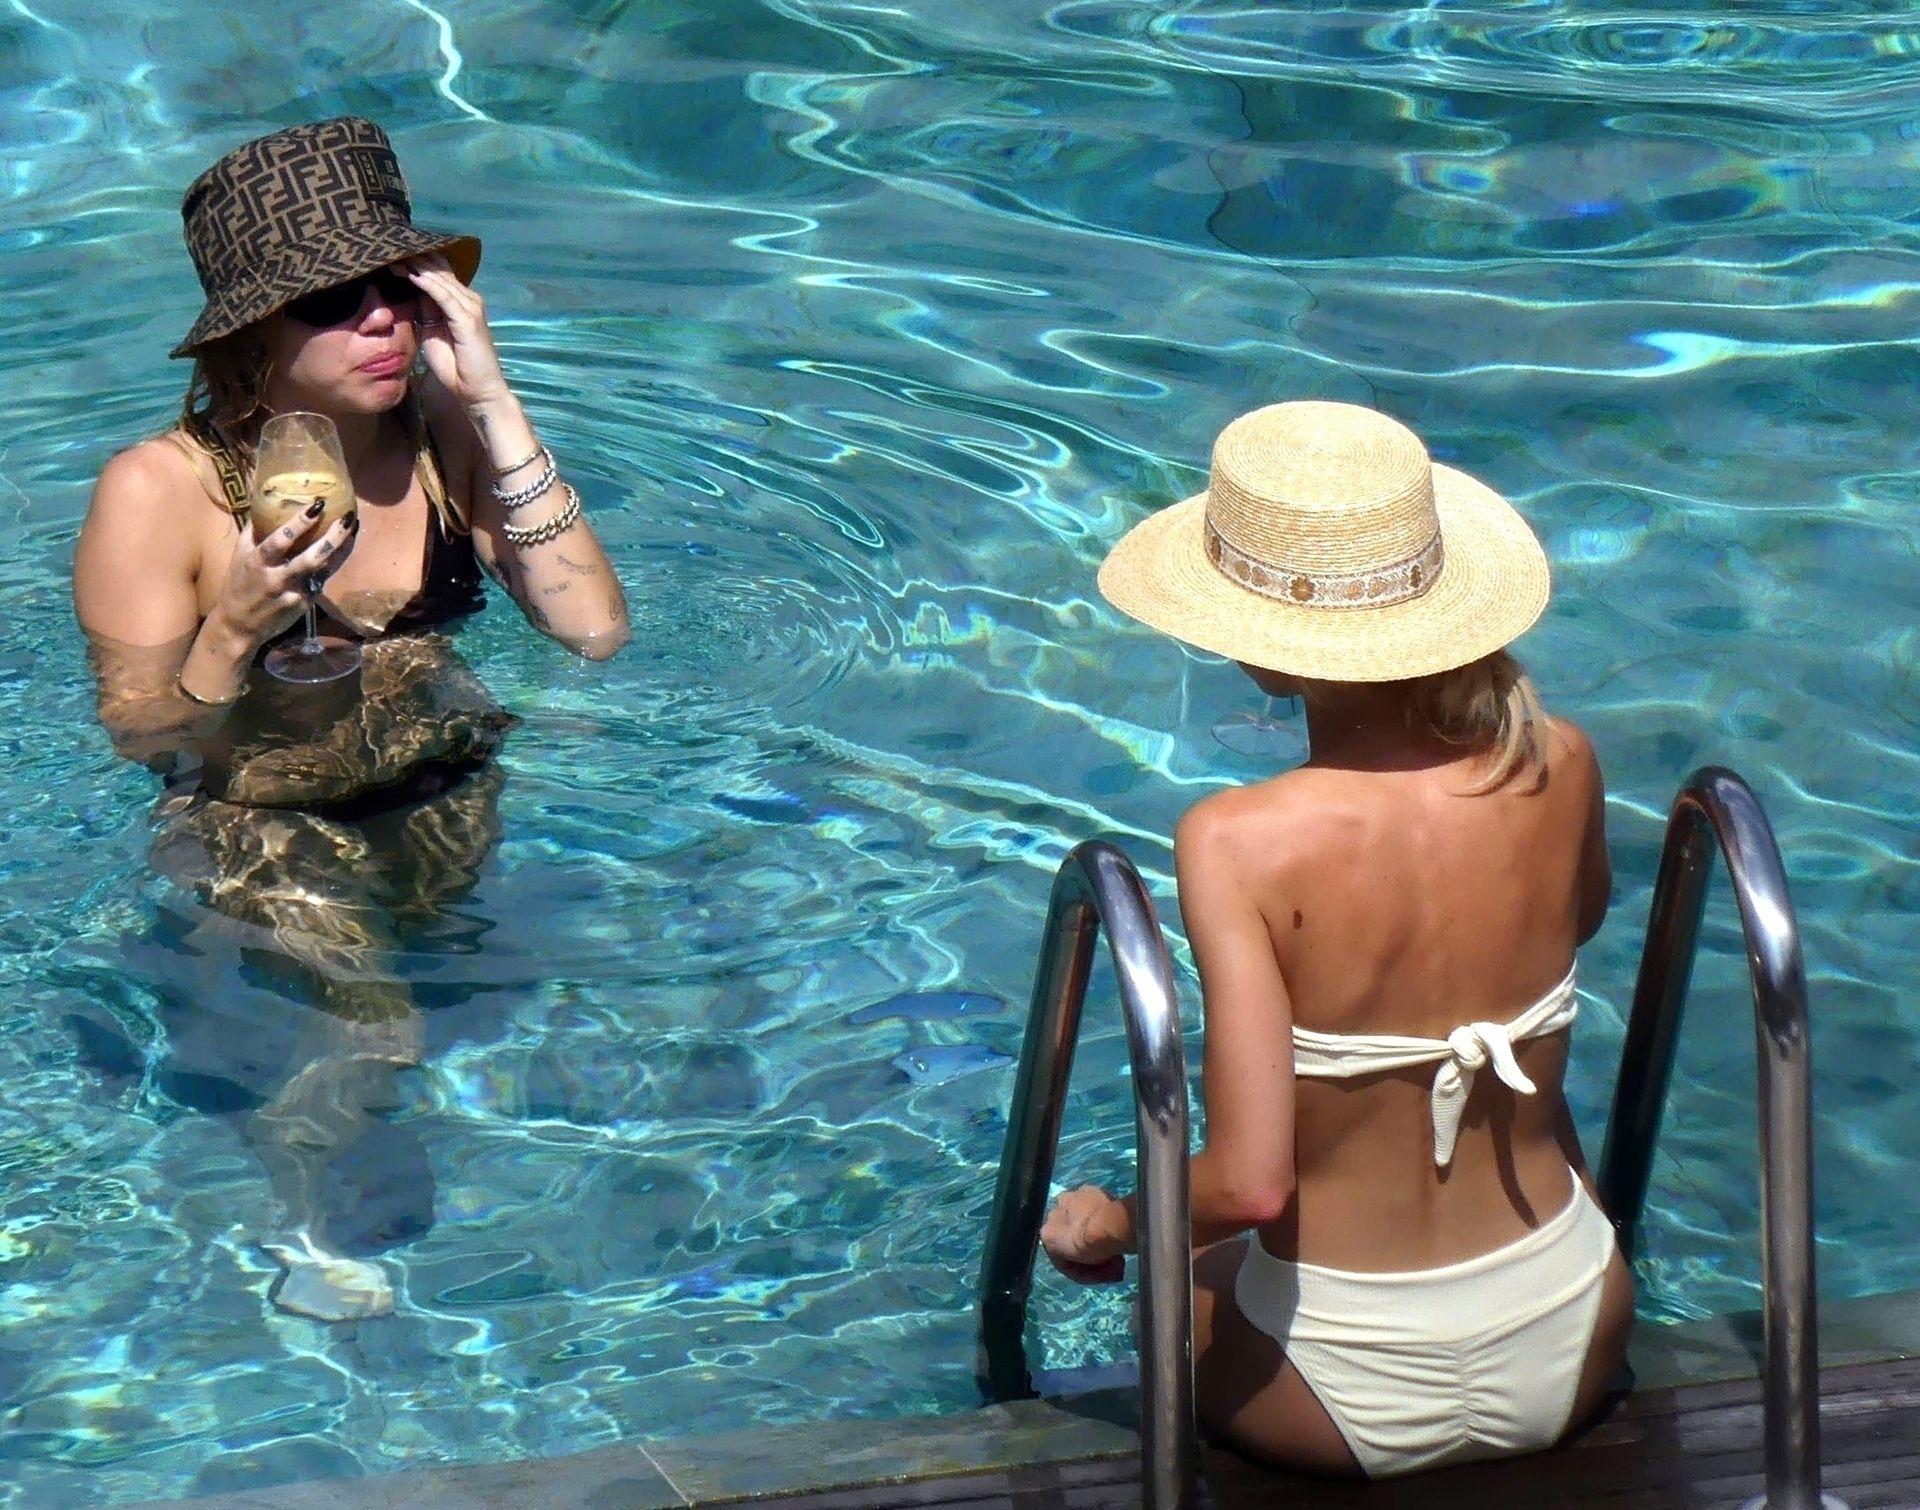 0713004446900_49_Miley-Cyrus-Topless-Kaitlynn-Carter-Hot-TheFappeningBlog.com-49.jpg